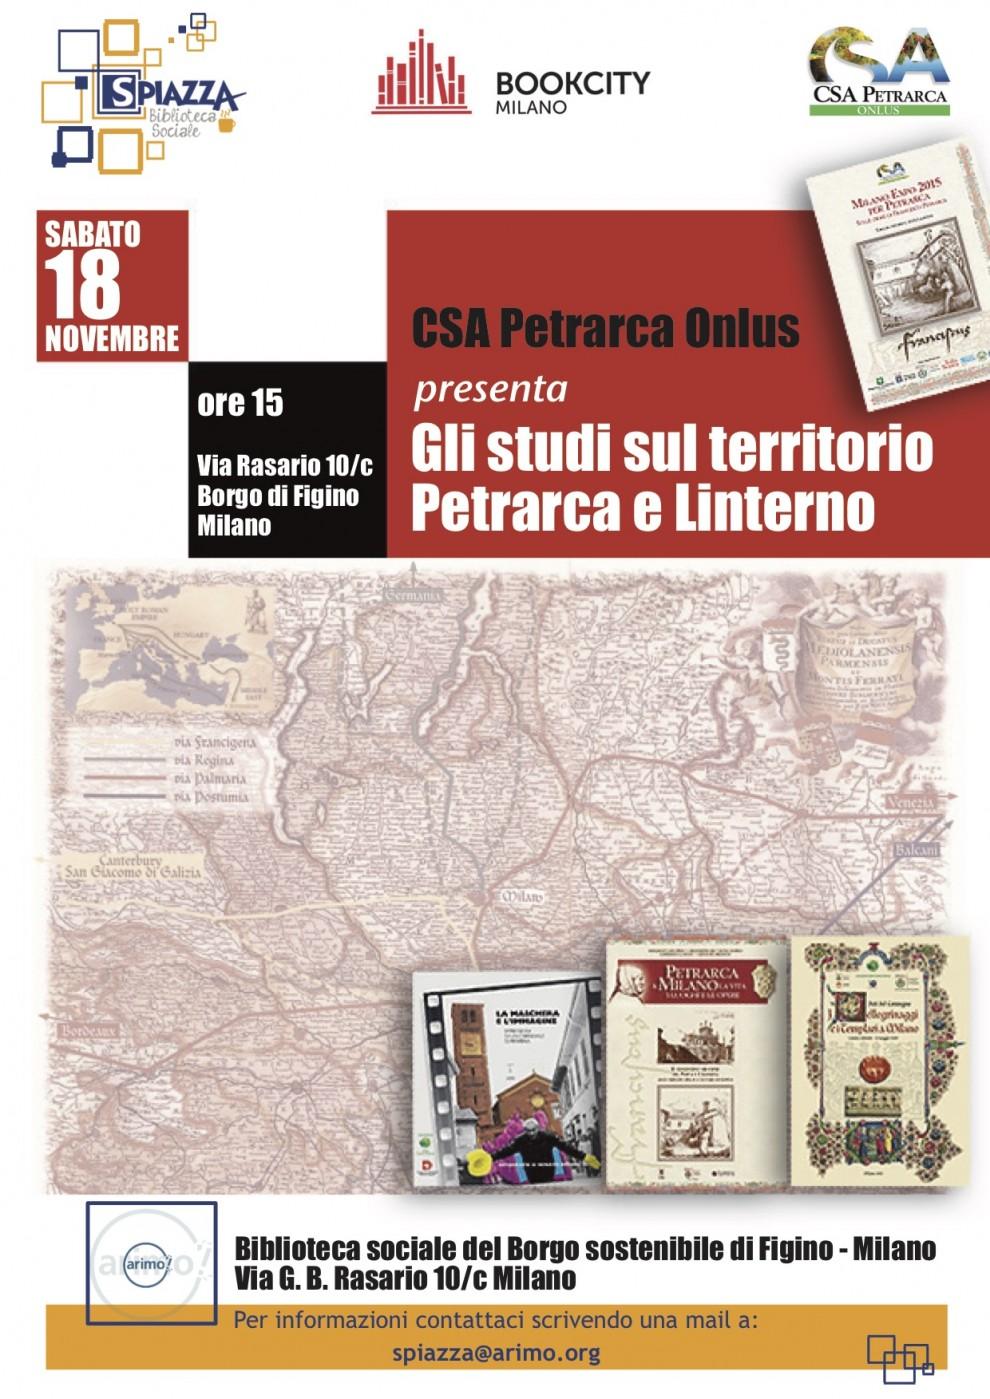 locandina_BookCity 2017_CSA Petrarca (2017)